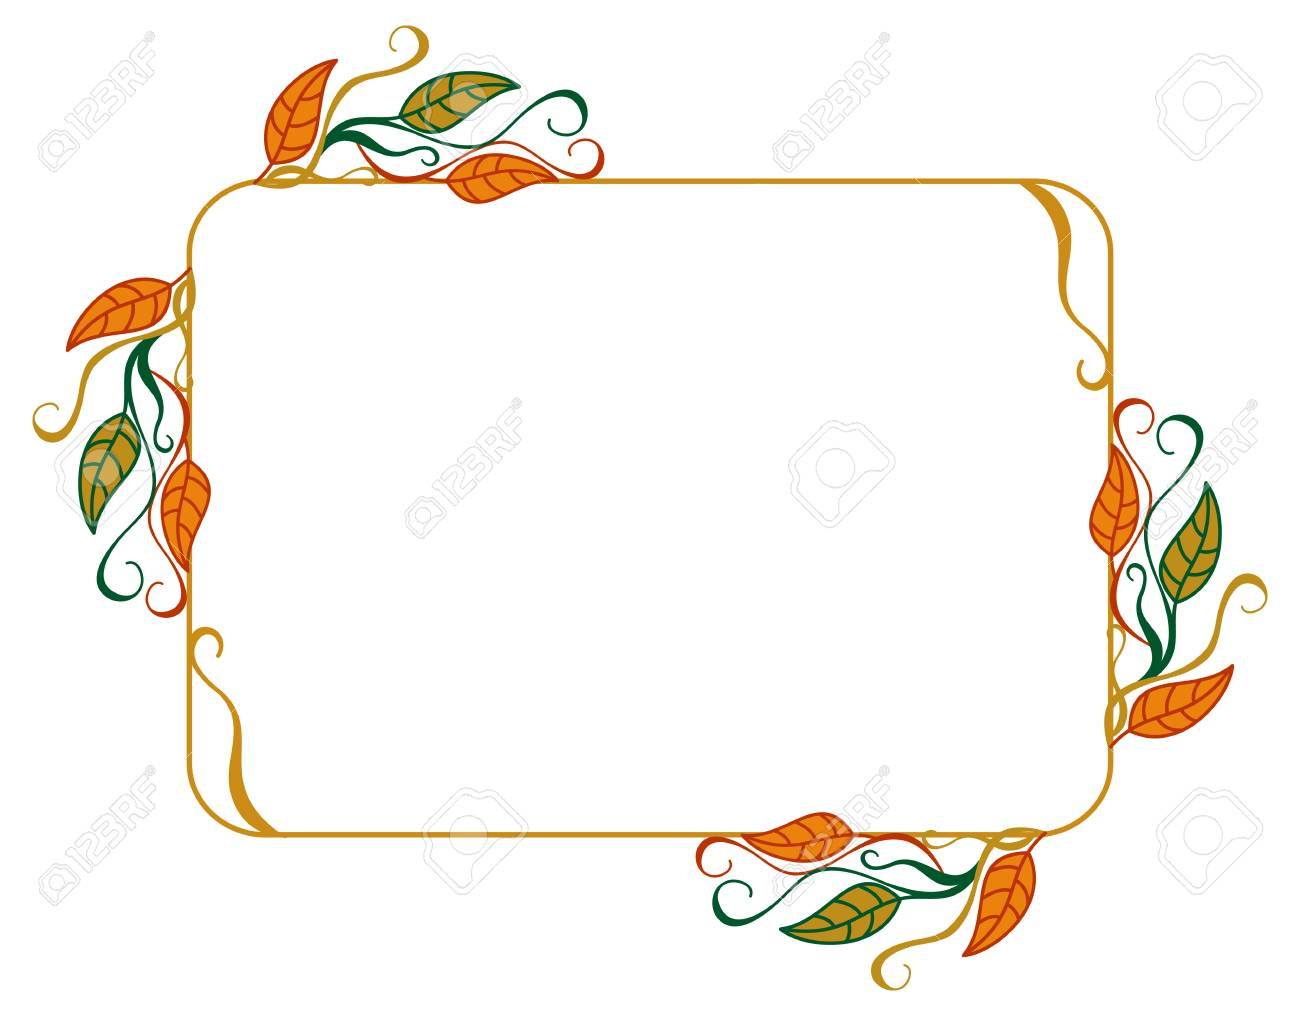 horizontal, color, decorative, leaves, vector, 'clip art', art